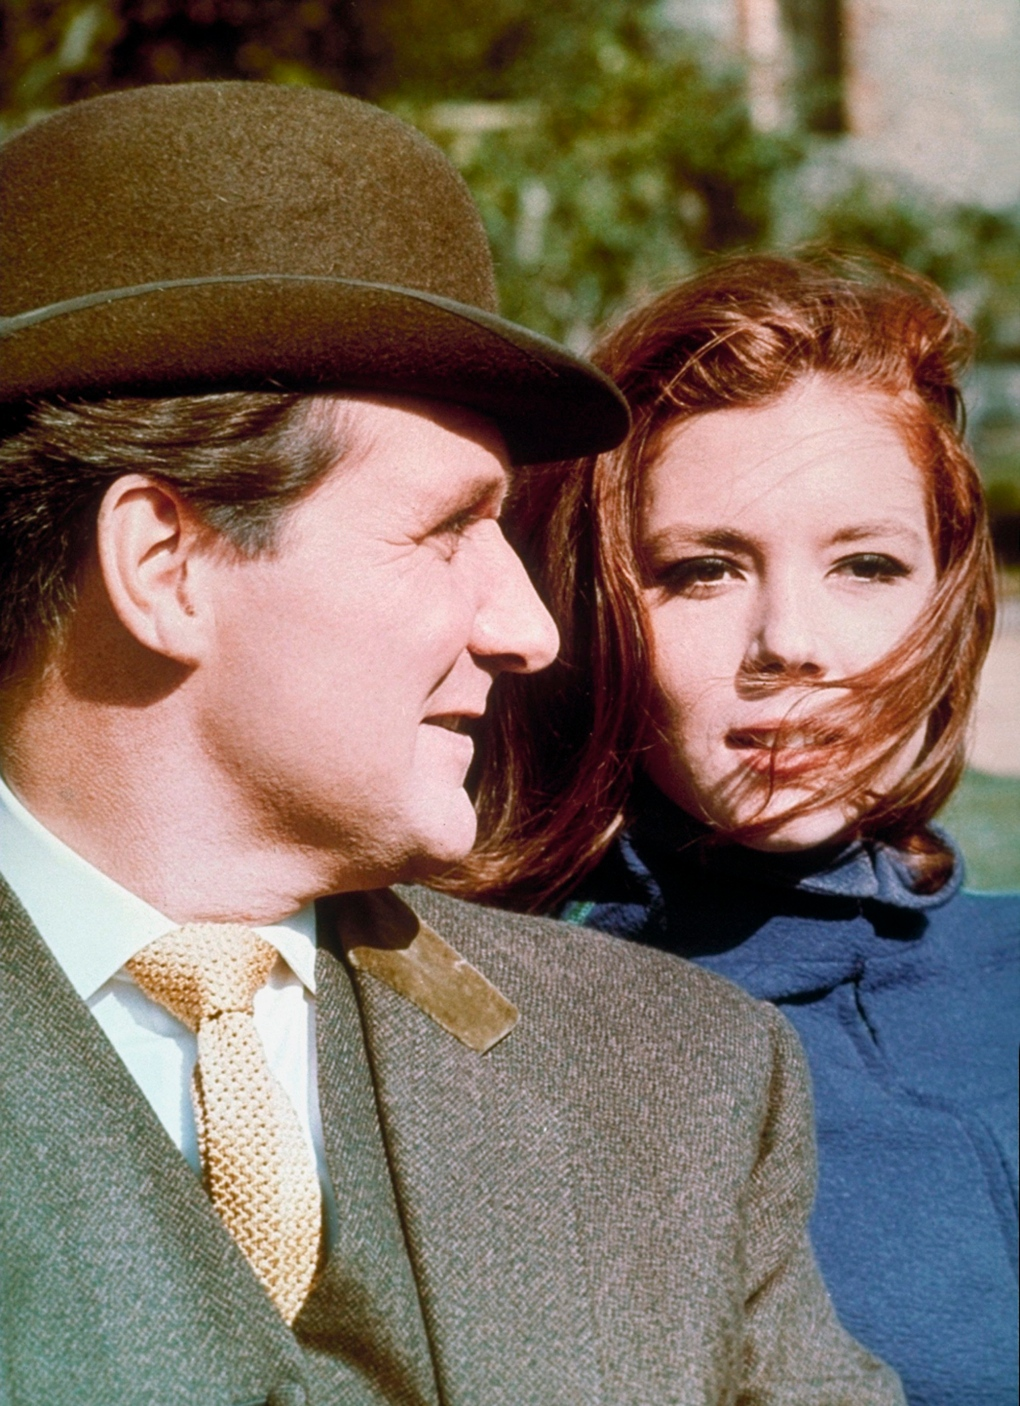 Scene from 1960 series 'The Avengers'